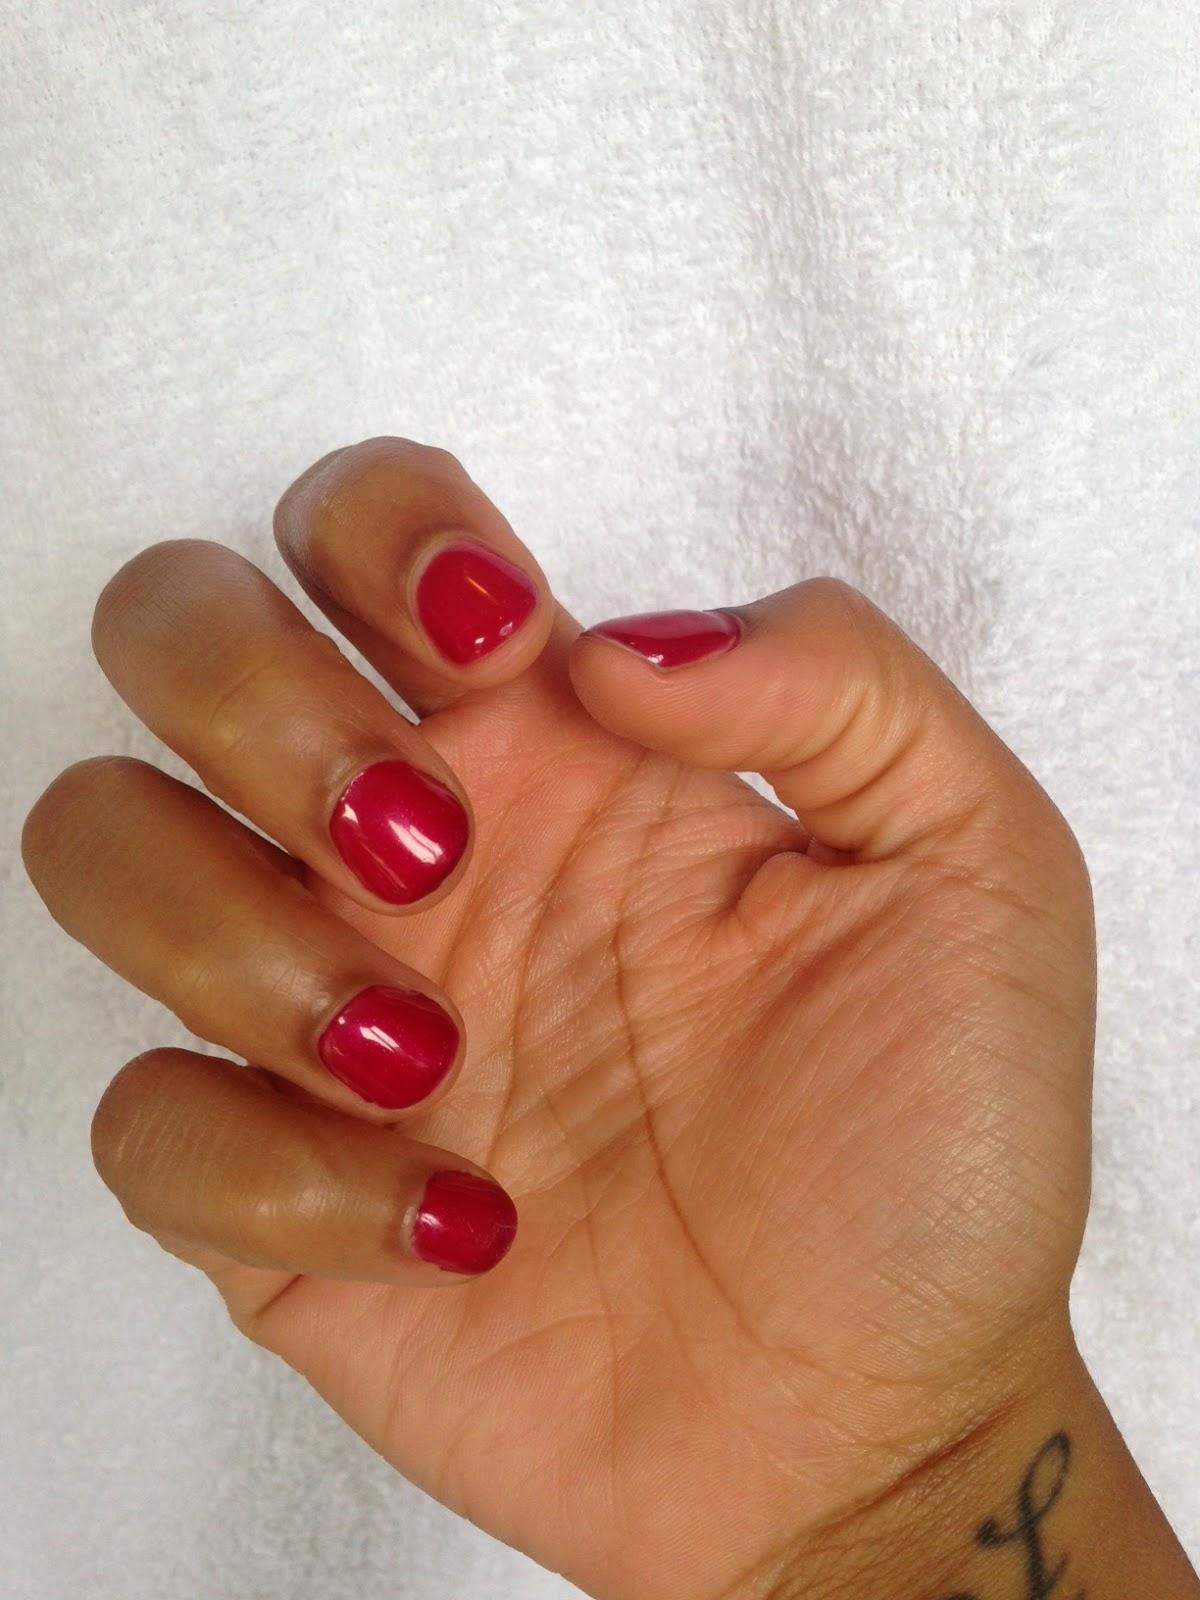 Nailed It! SensatioNail Gel Nail Review - The Pretty Girls Guide